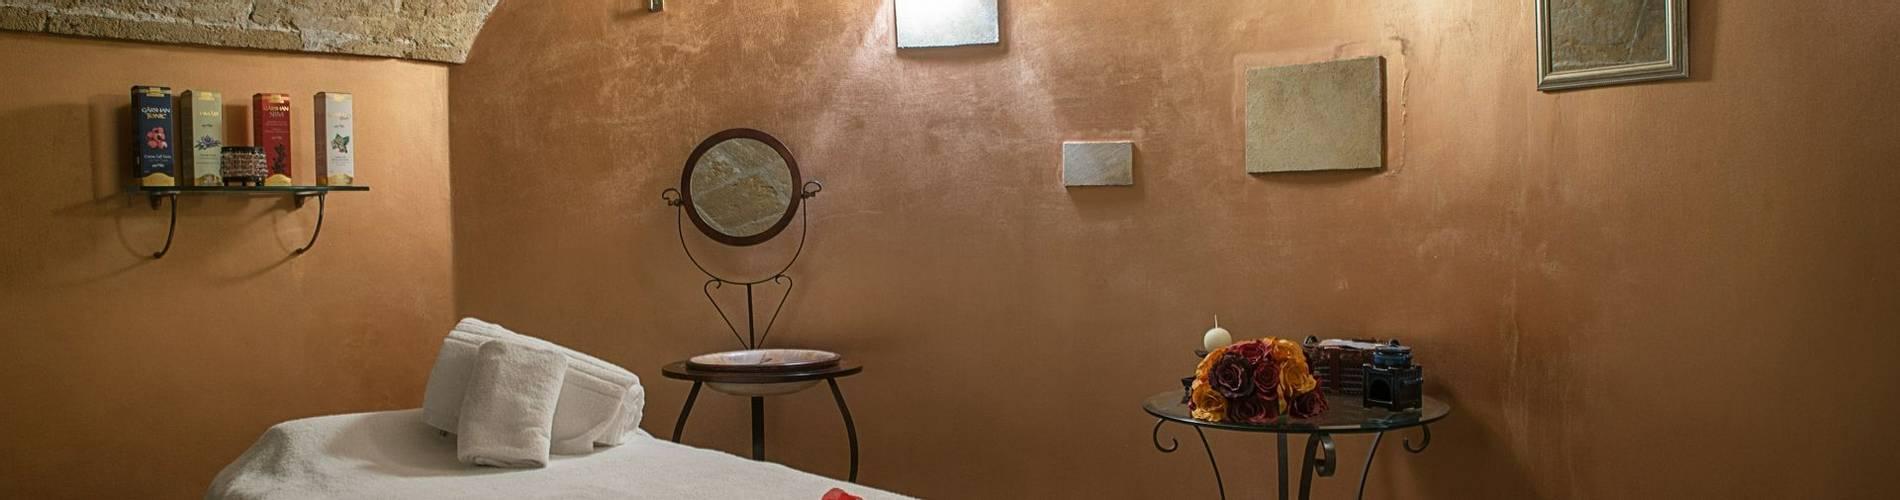 Grand Hotel Ortigia, Sicily, Italy (25).jpg